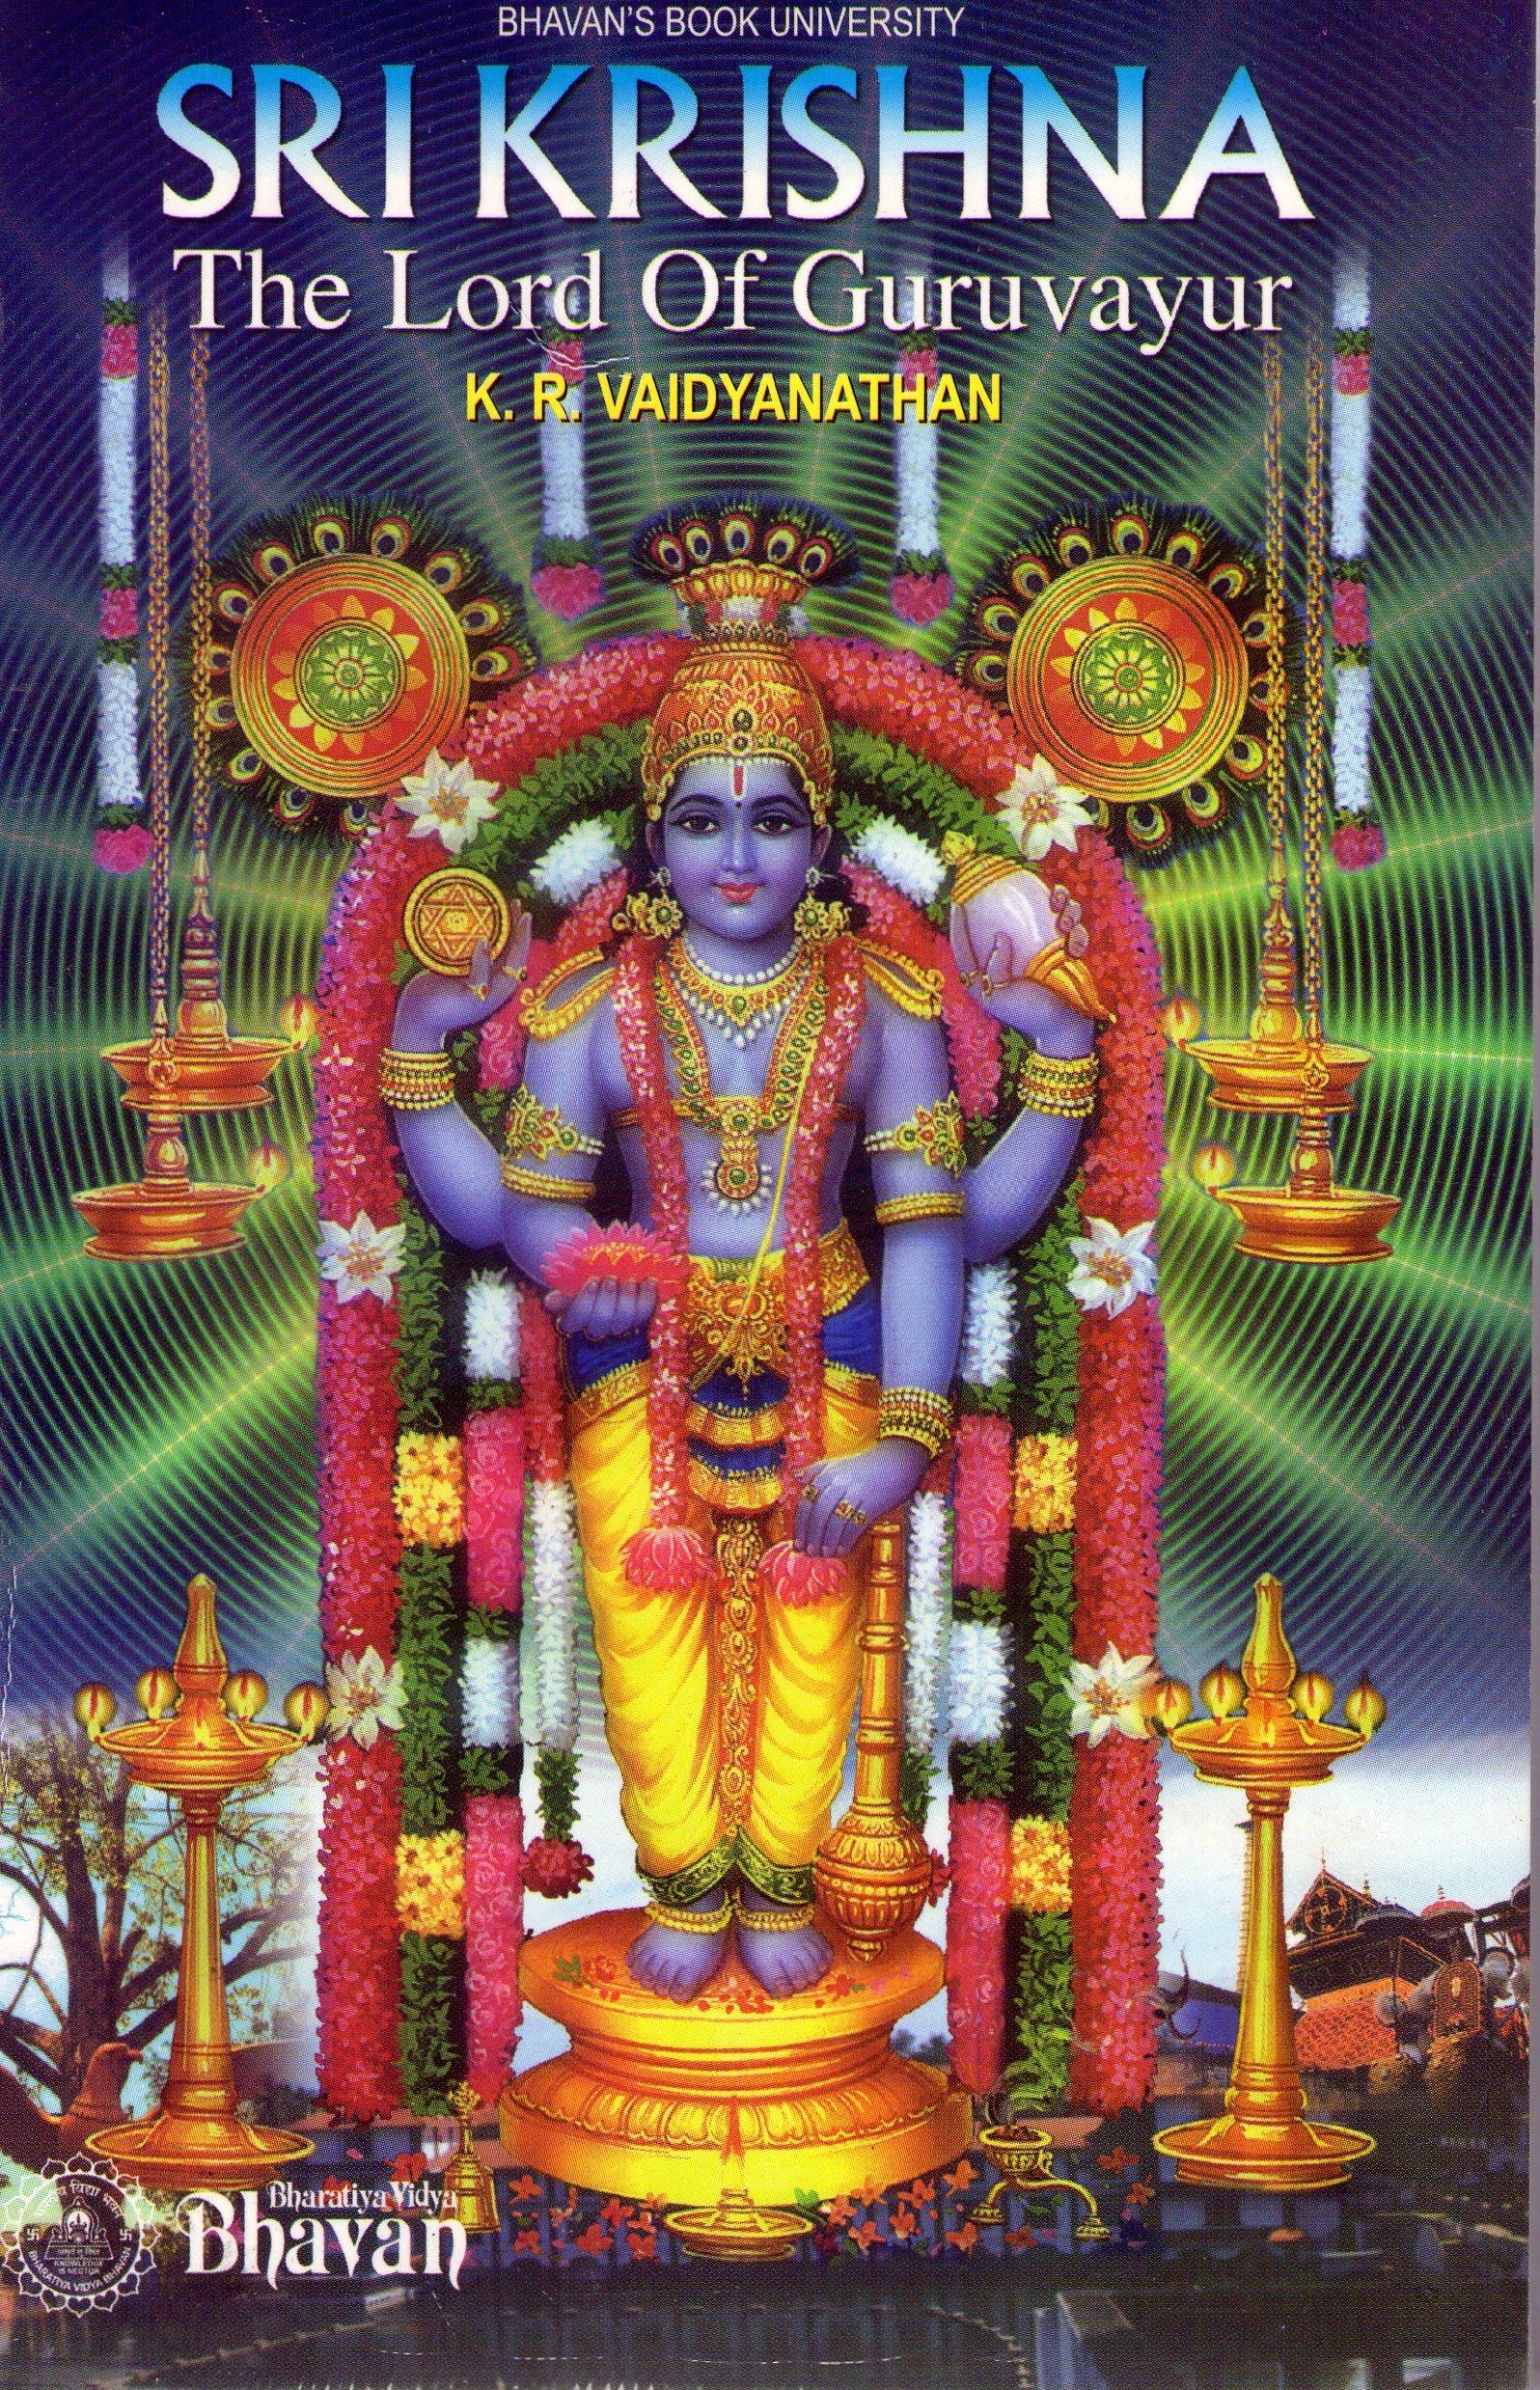 Sri Krishna The Lord Of Guruvayur K R Vaidyanathan 9788172763800 Amazon Com Books